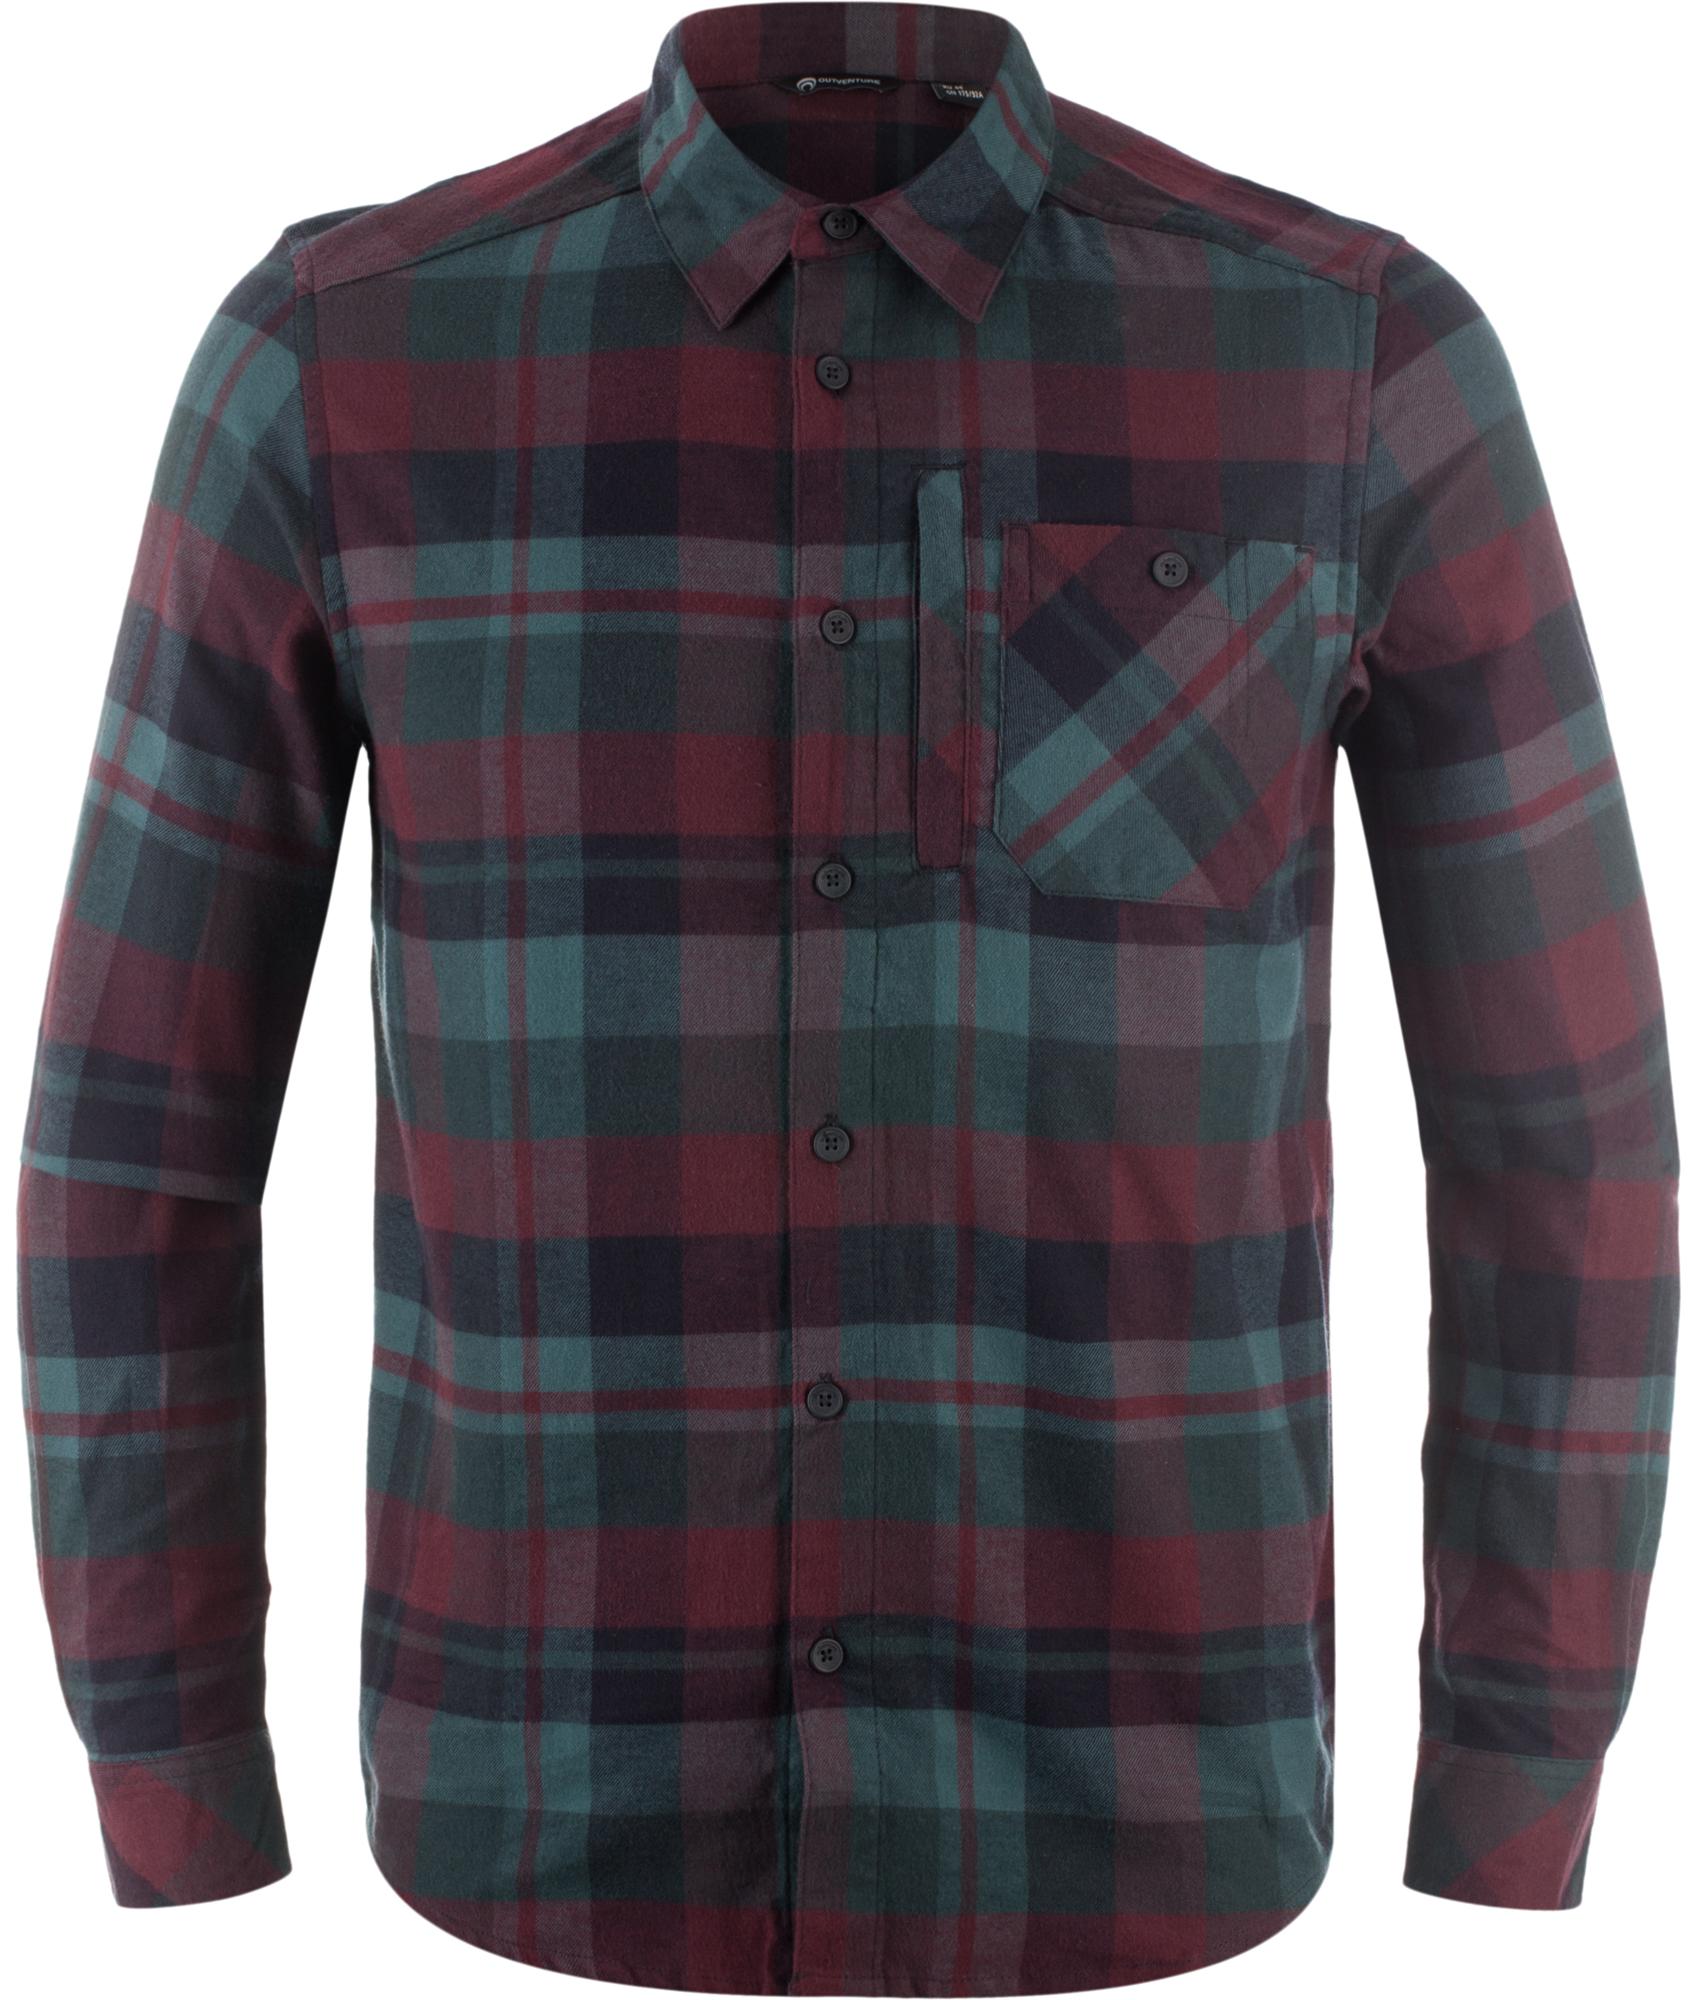 Outventure Рубашка с длинным рукавом мужская Outventure